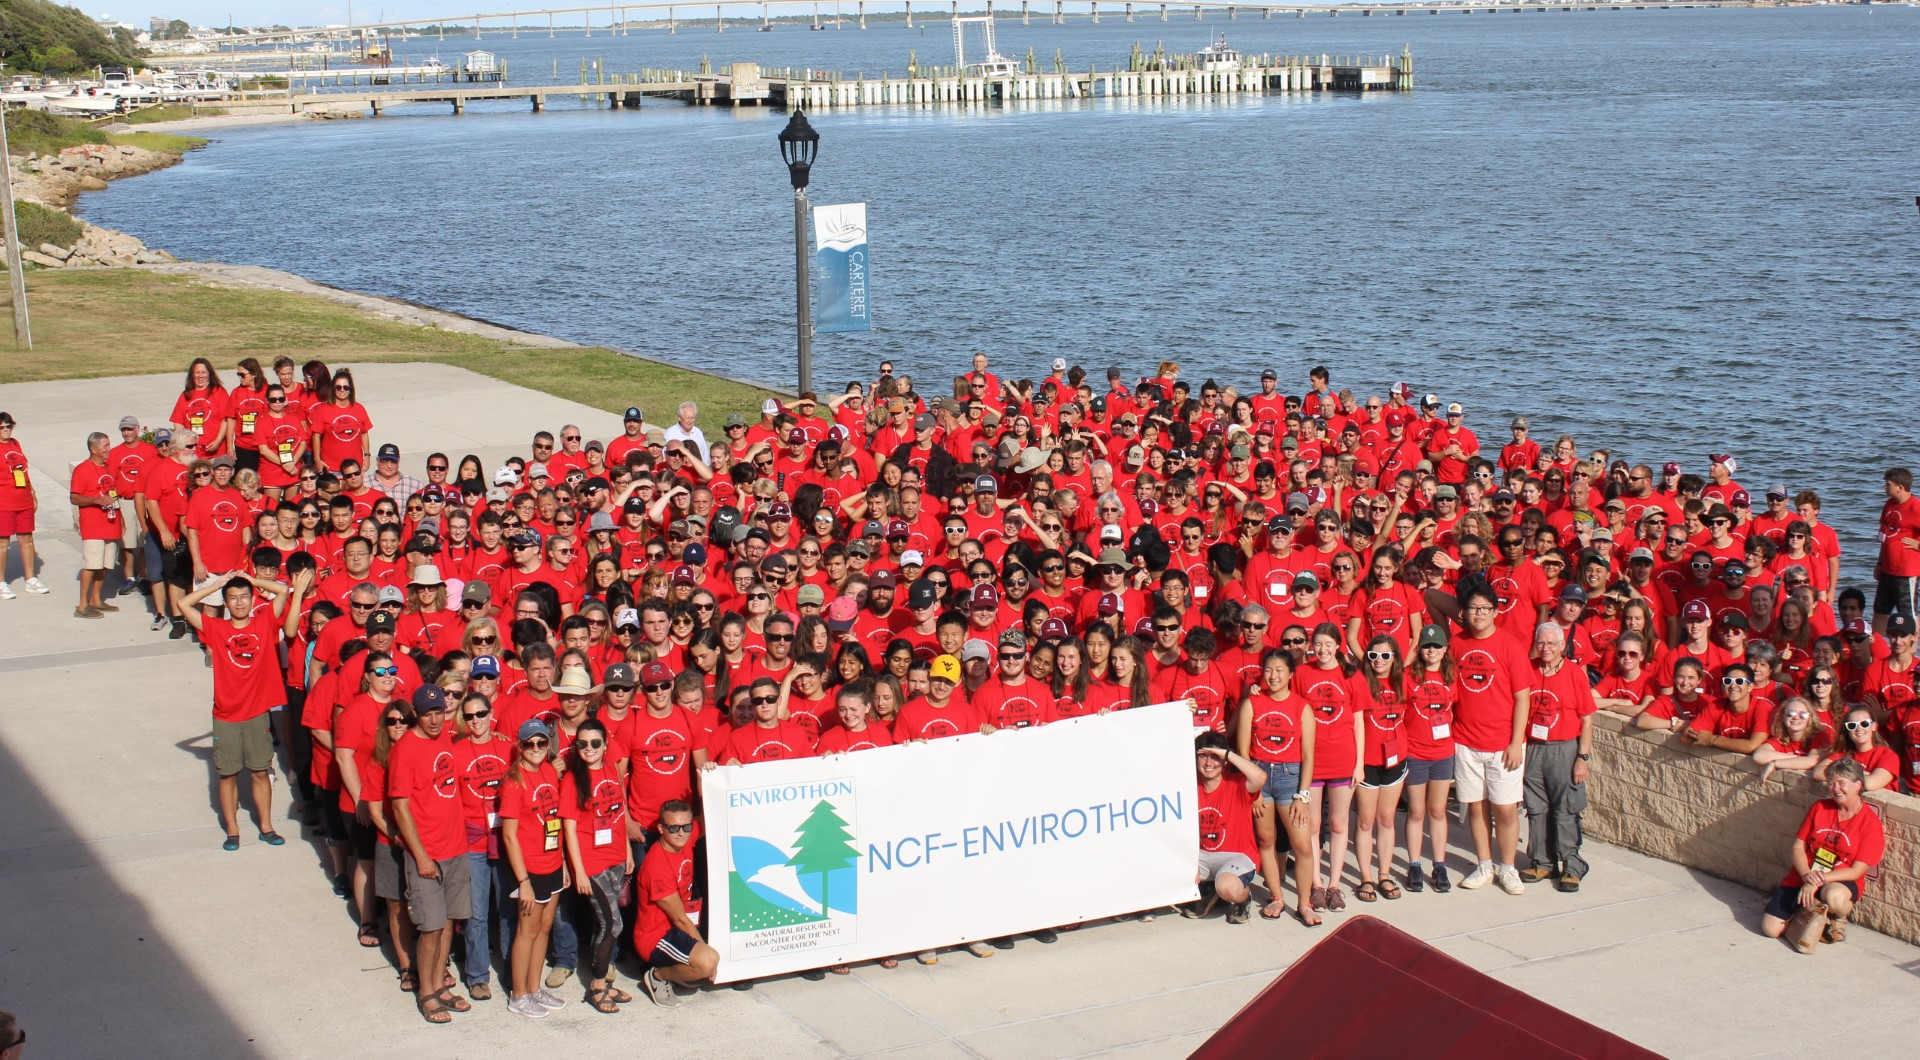 2019 NCF-Envirothon-Group